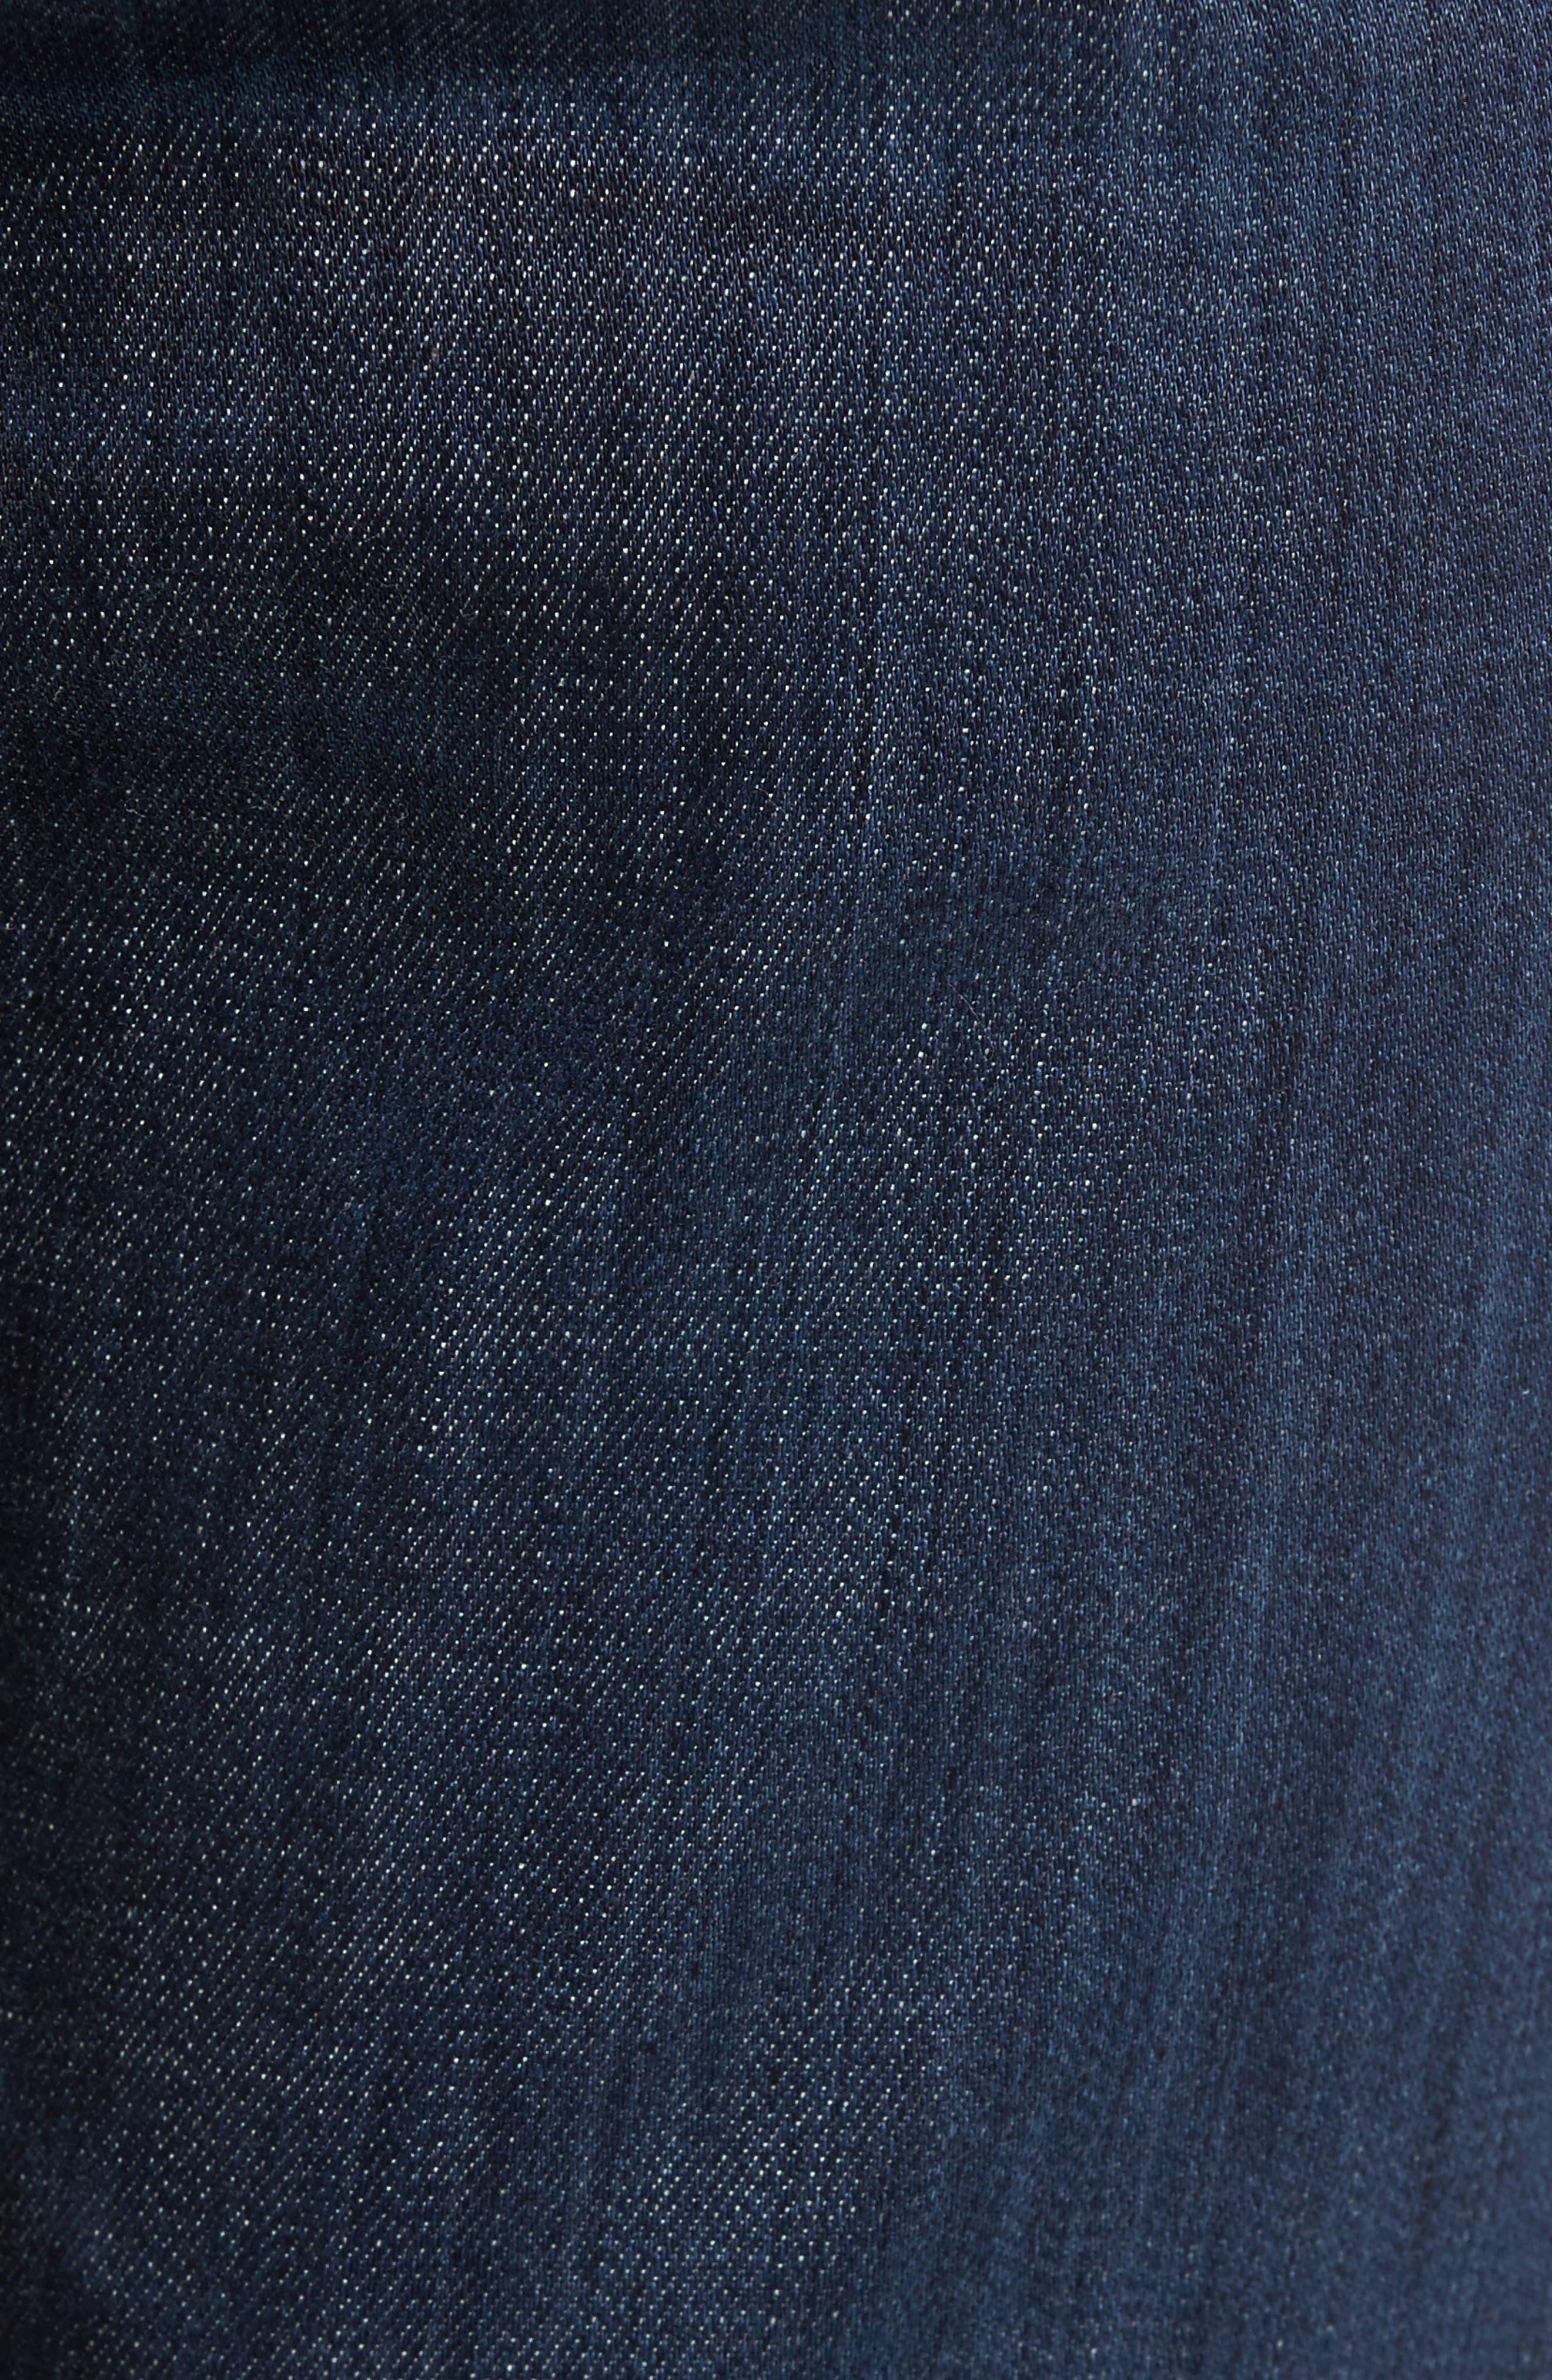 Graduate Slim Straight Leg Jeans,                             Alternate thumbnail 5, color,                             472